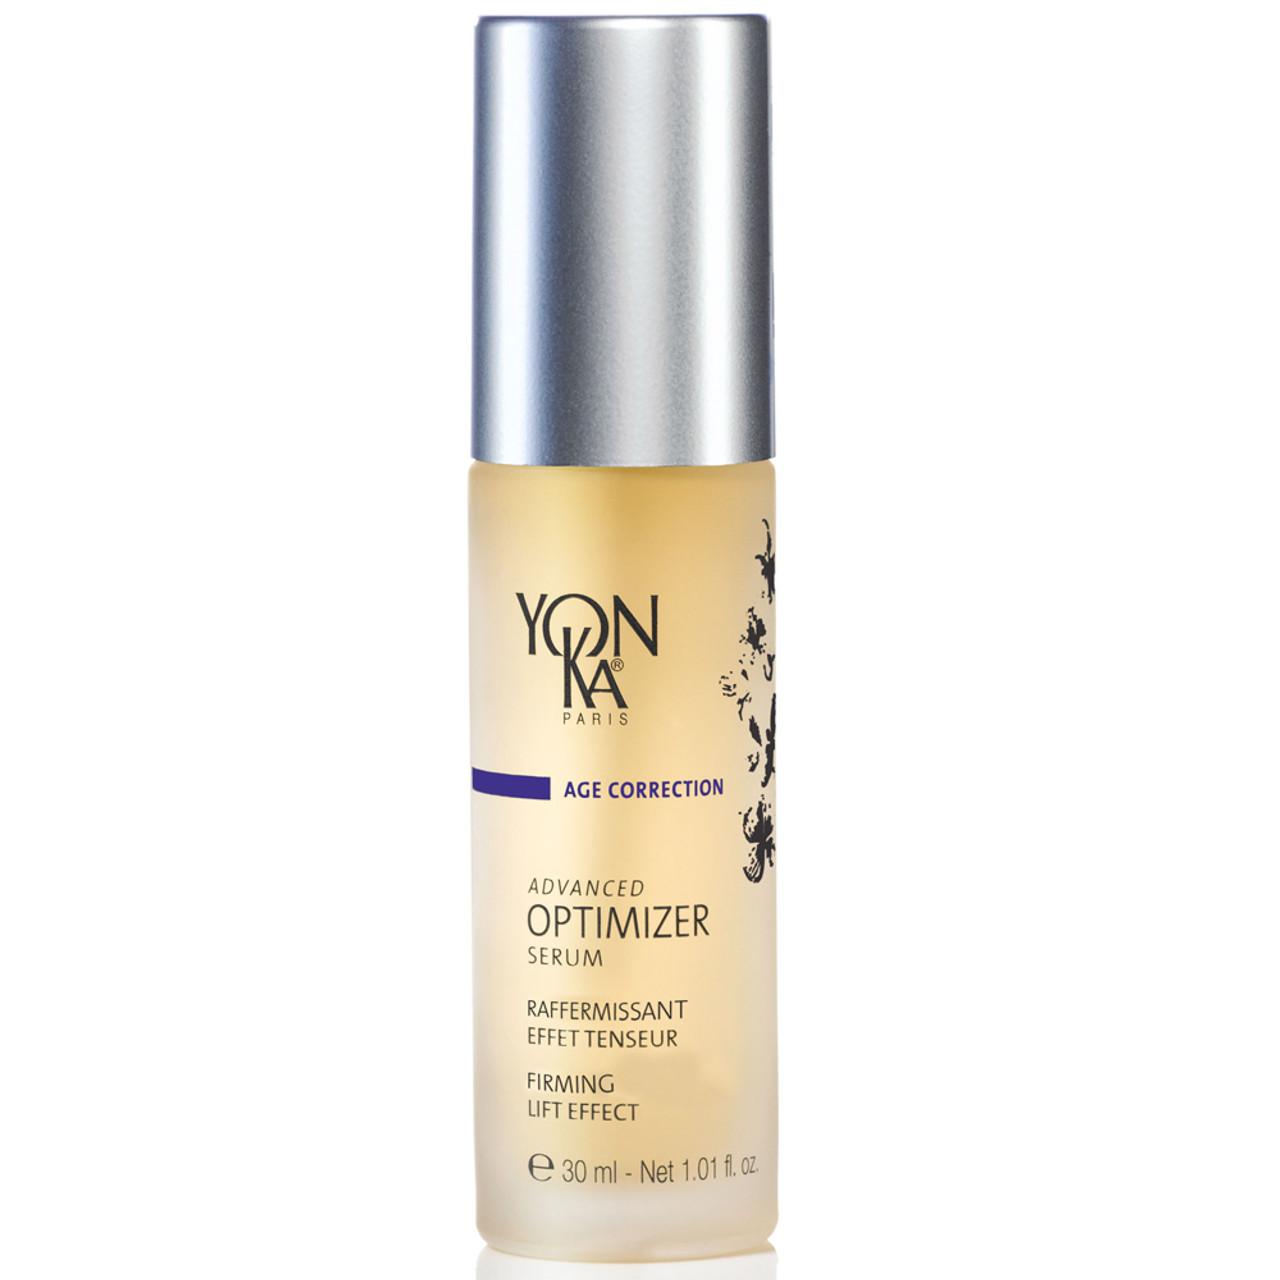 YonKa Advanced Optimizer Serum